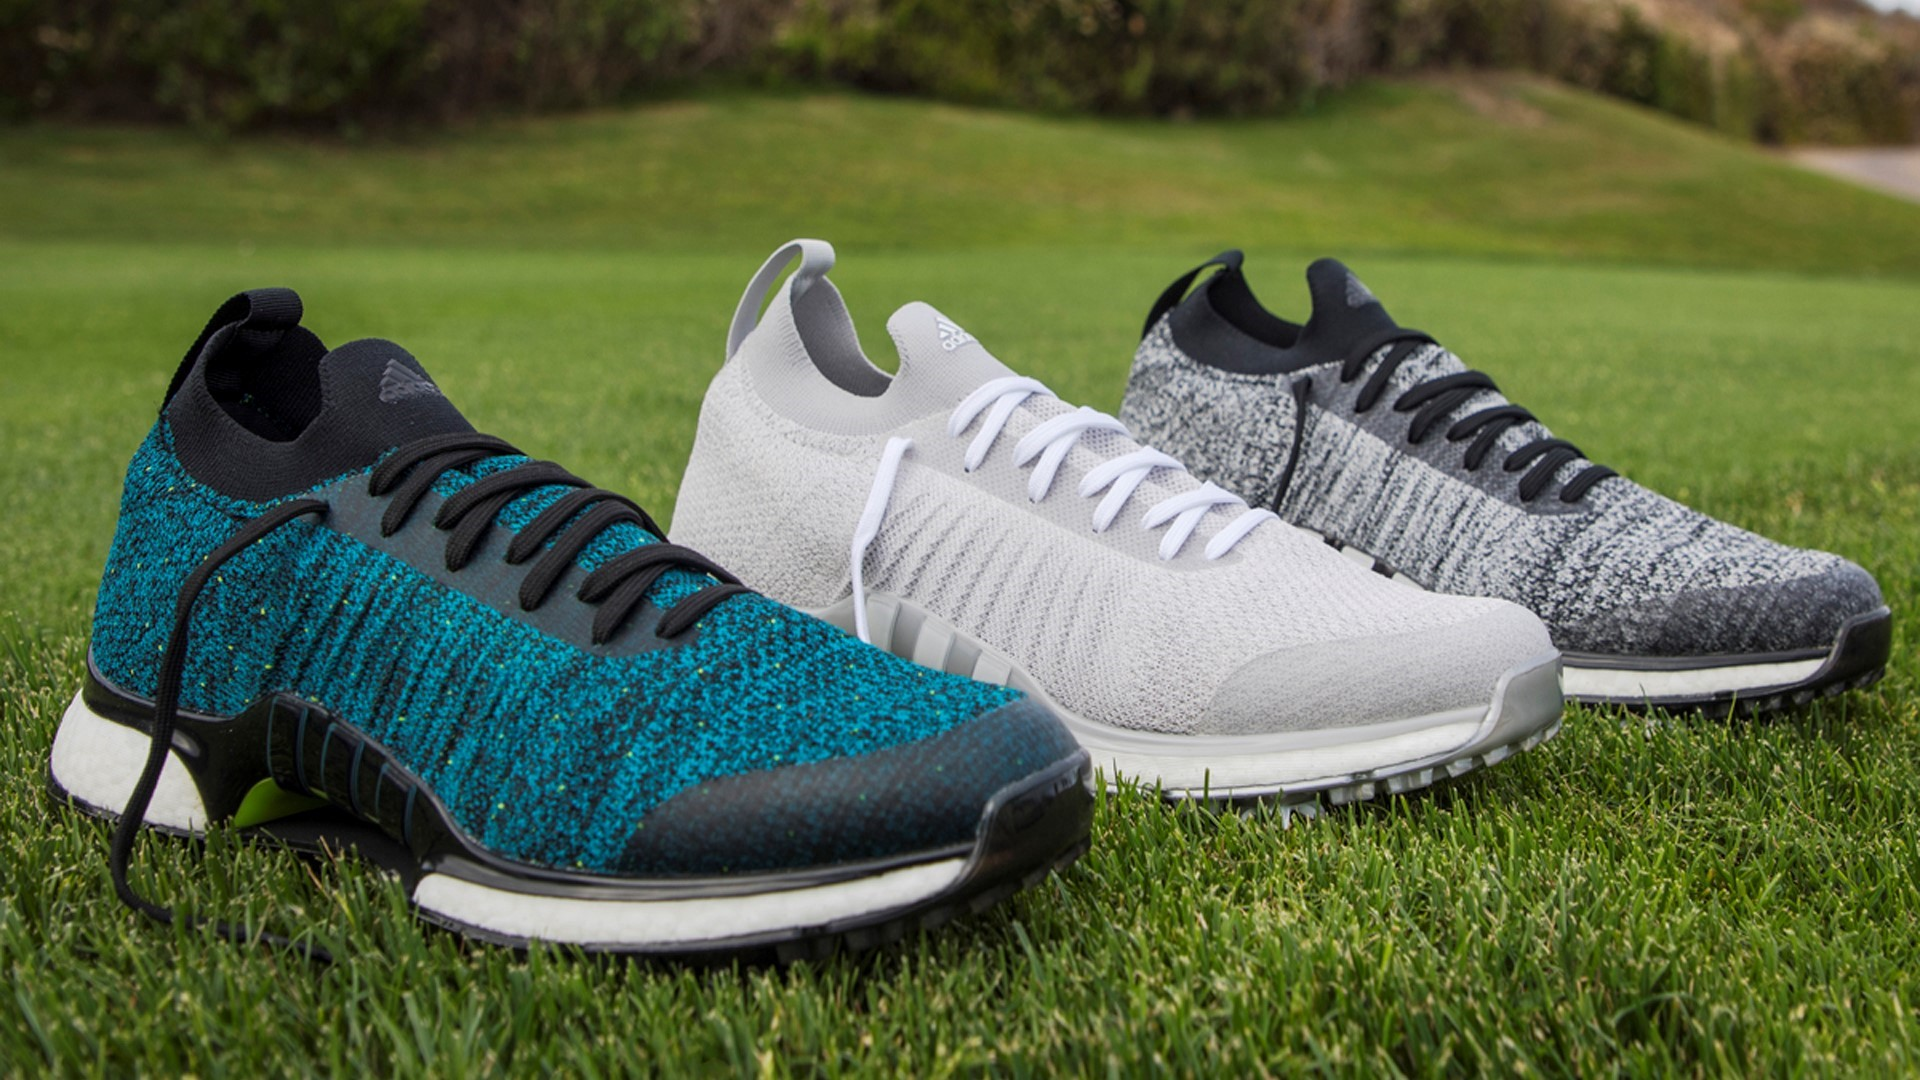 adidas golf waterproof